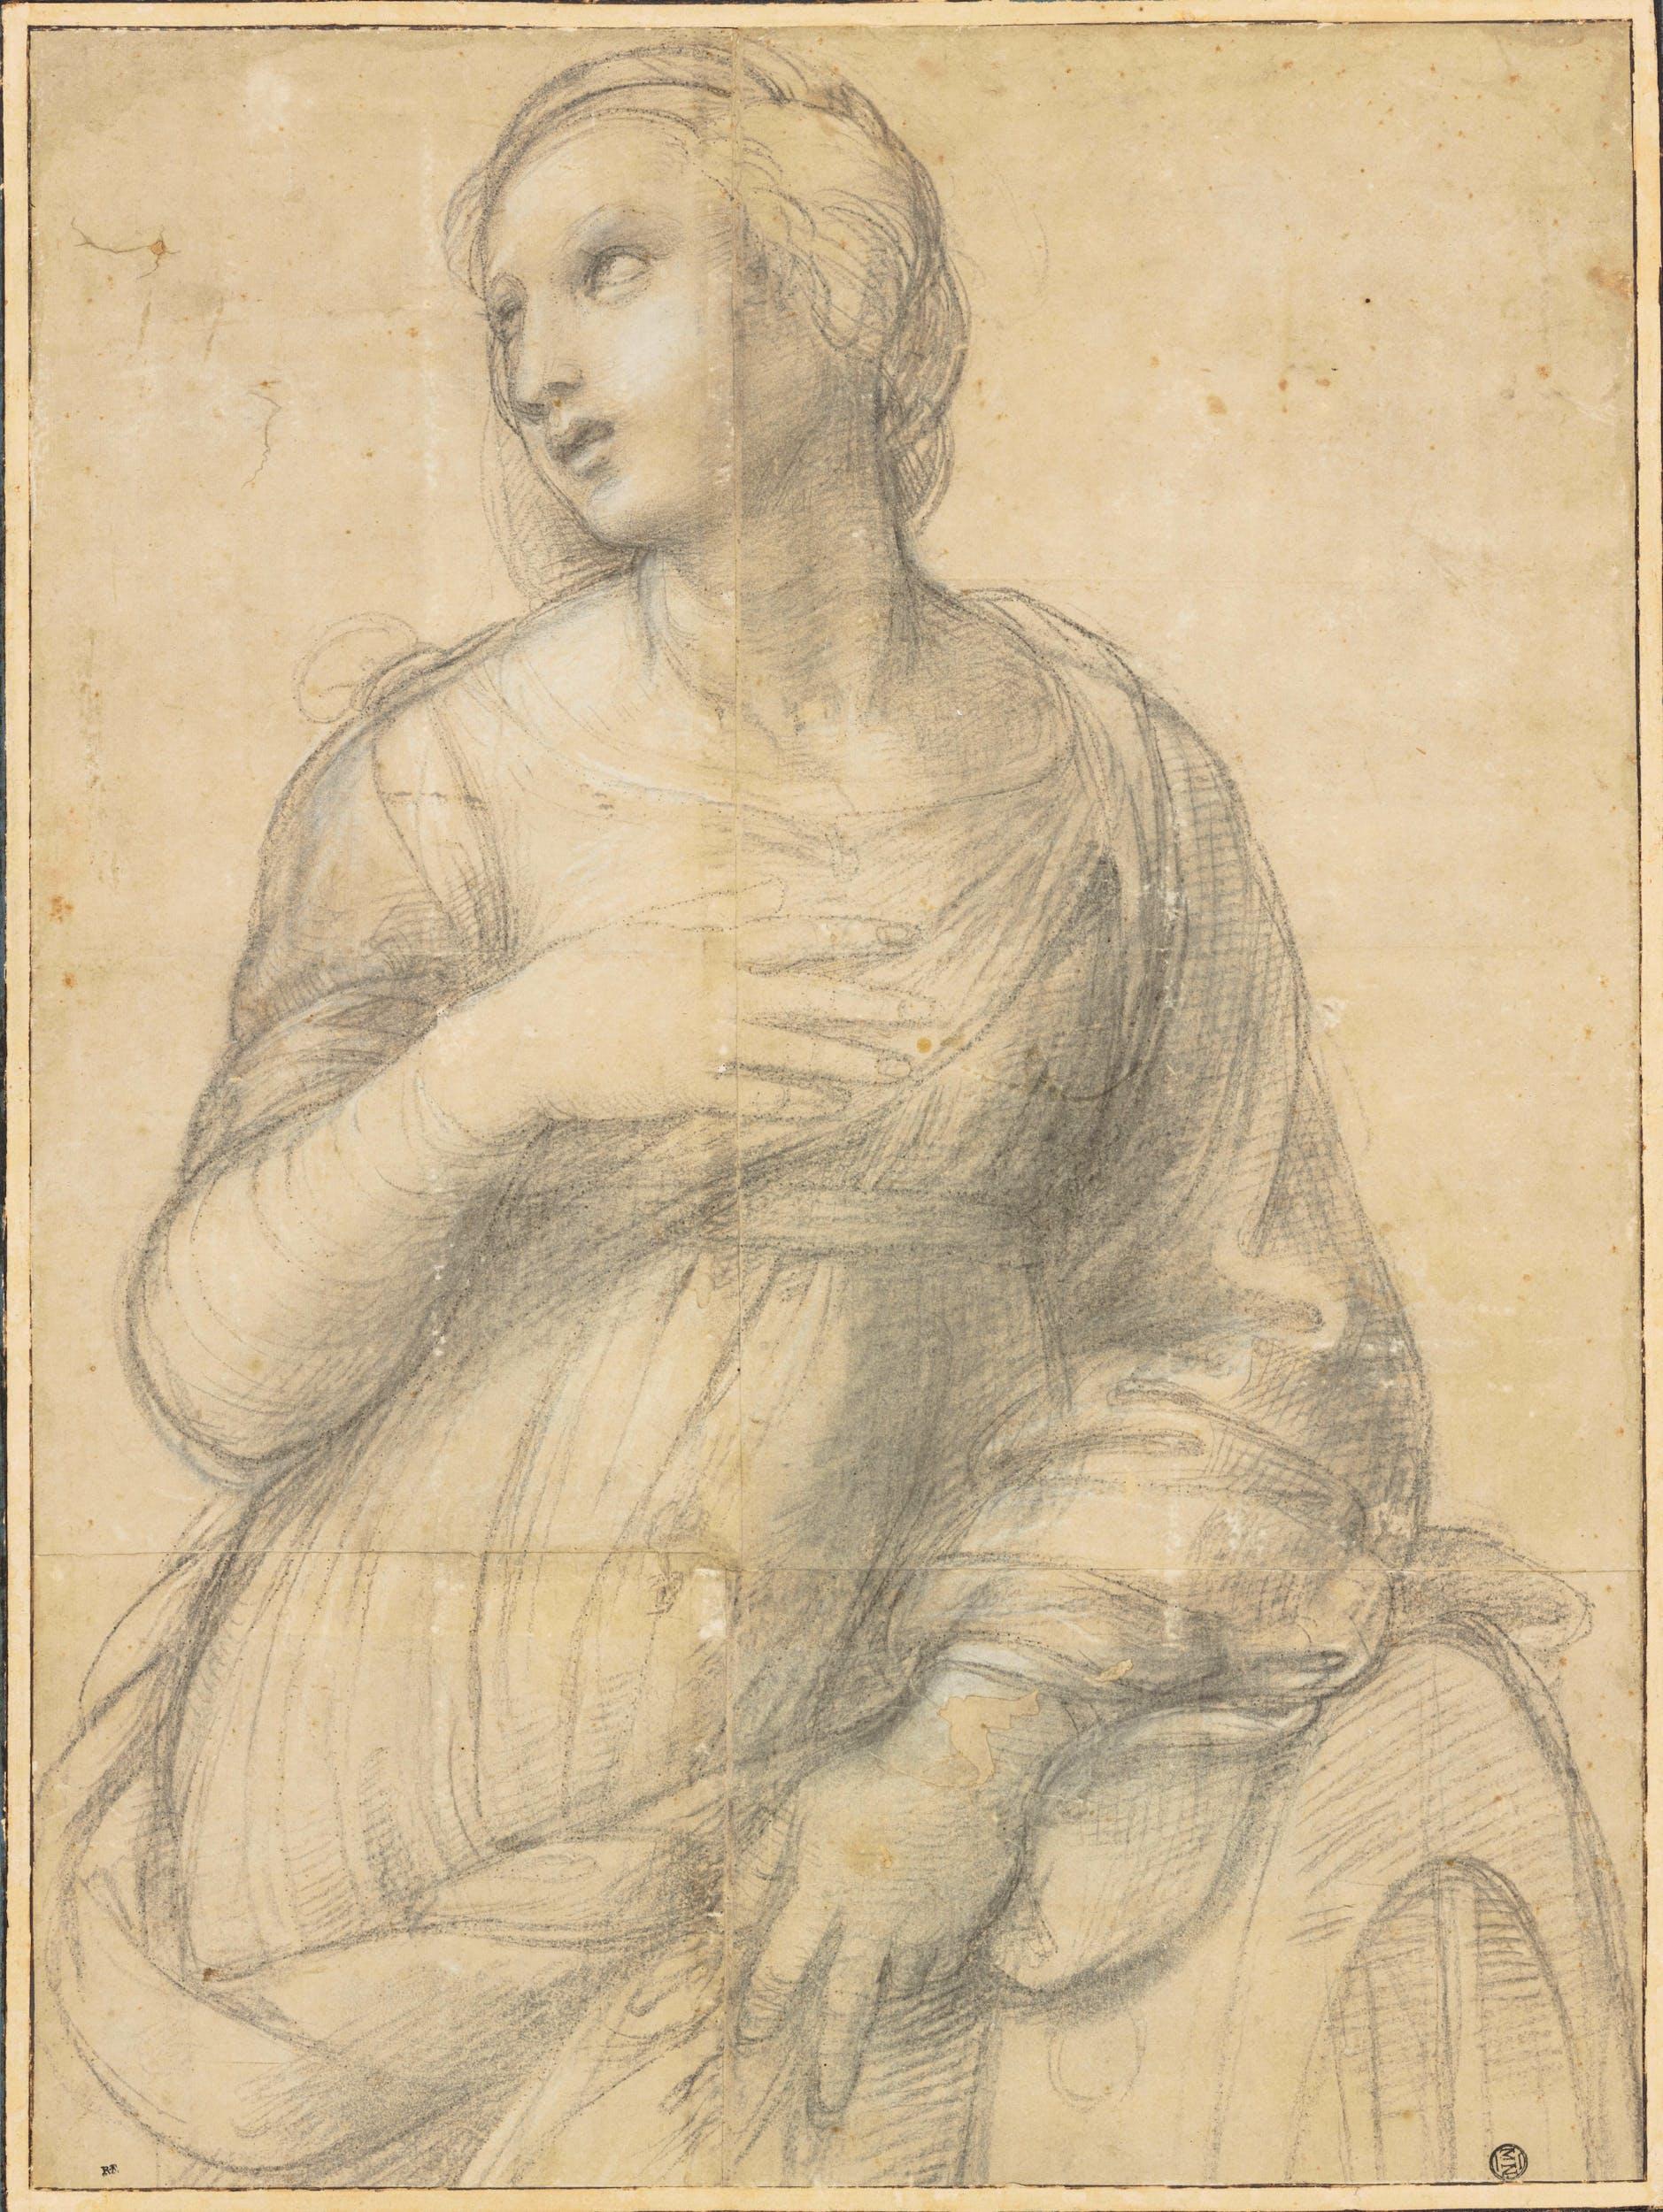 Raffaello Santa Caterina d'Alessandria 1507 circa pietra nera / black chalck Parigi, musée du Louvre, dèpartement des Arts graphiques